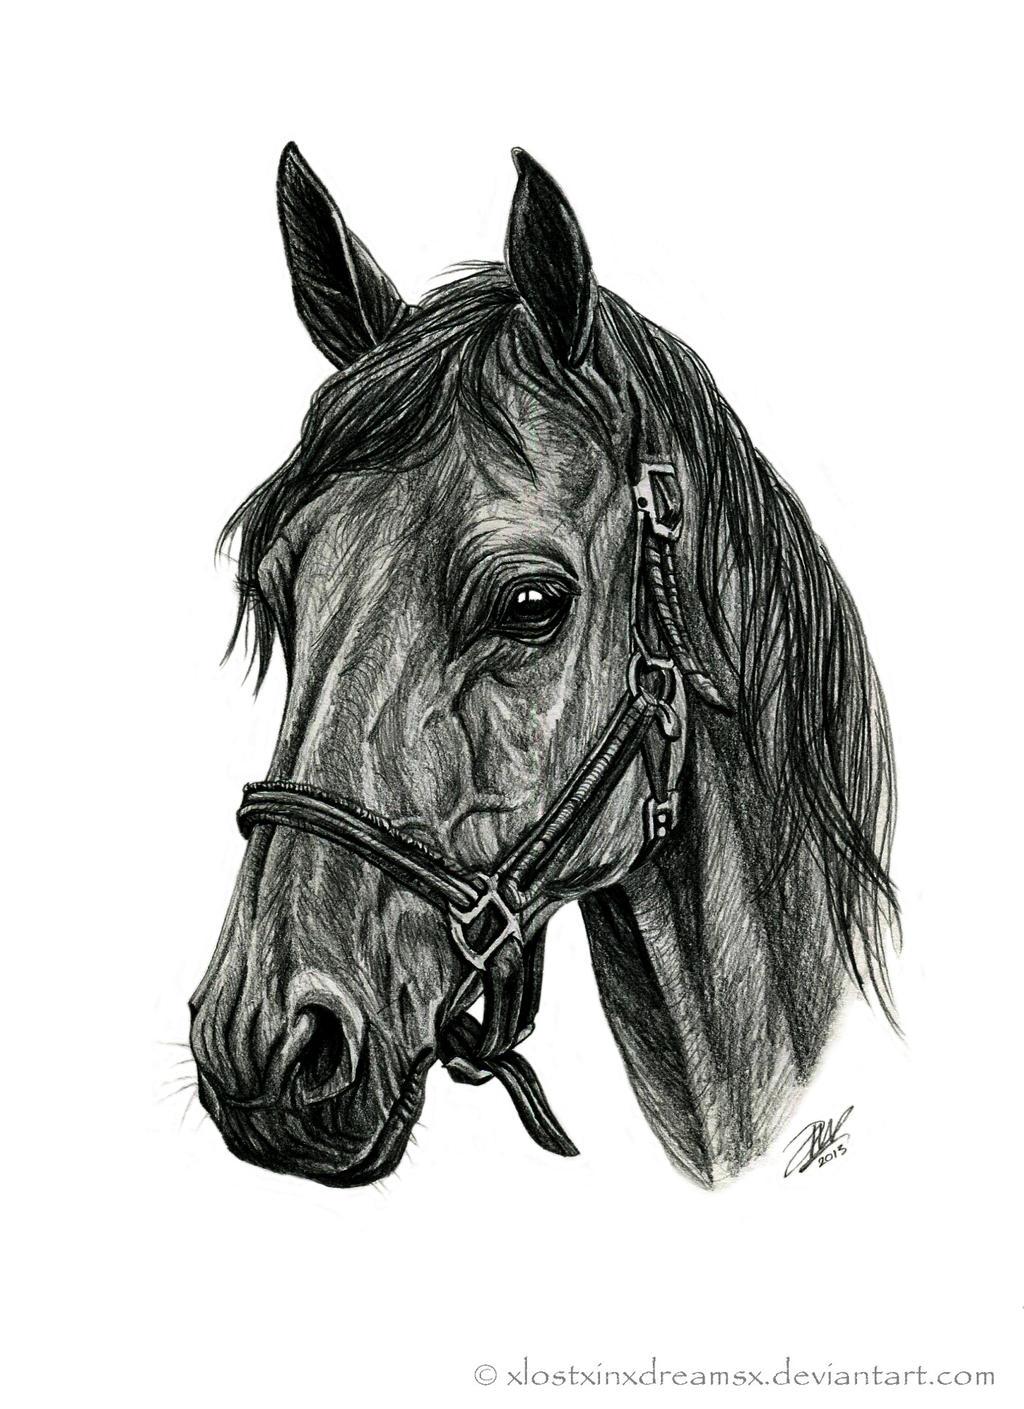 Quarter Horse by xlostxinxdreamsx on deviantART